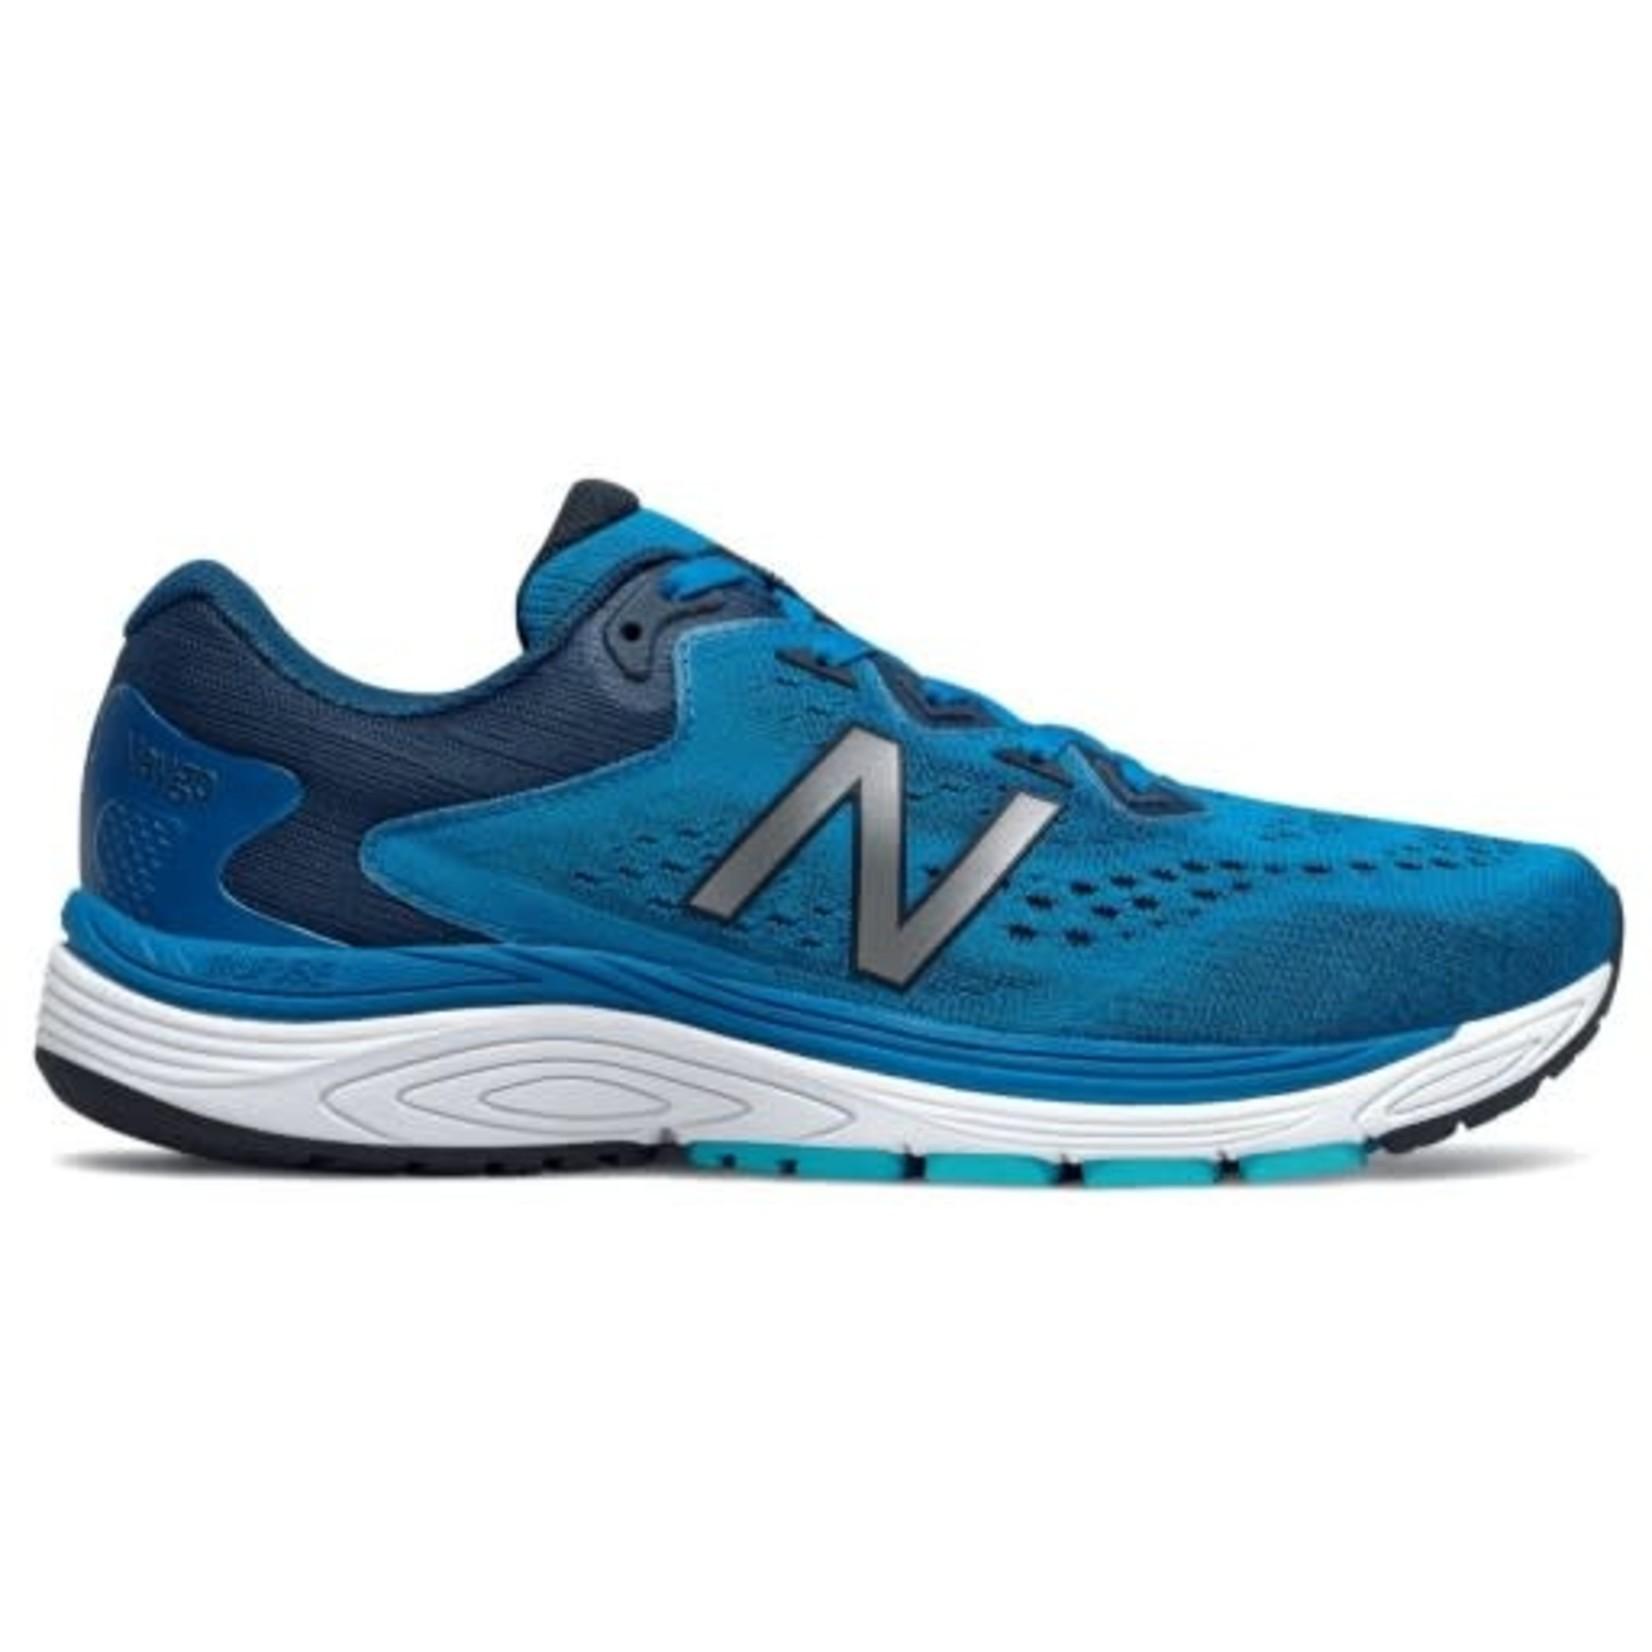 New Balance New Balance Running Shoes, MVYGOCV, Mens